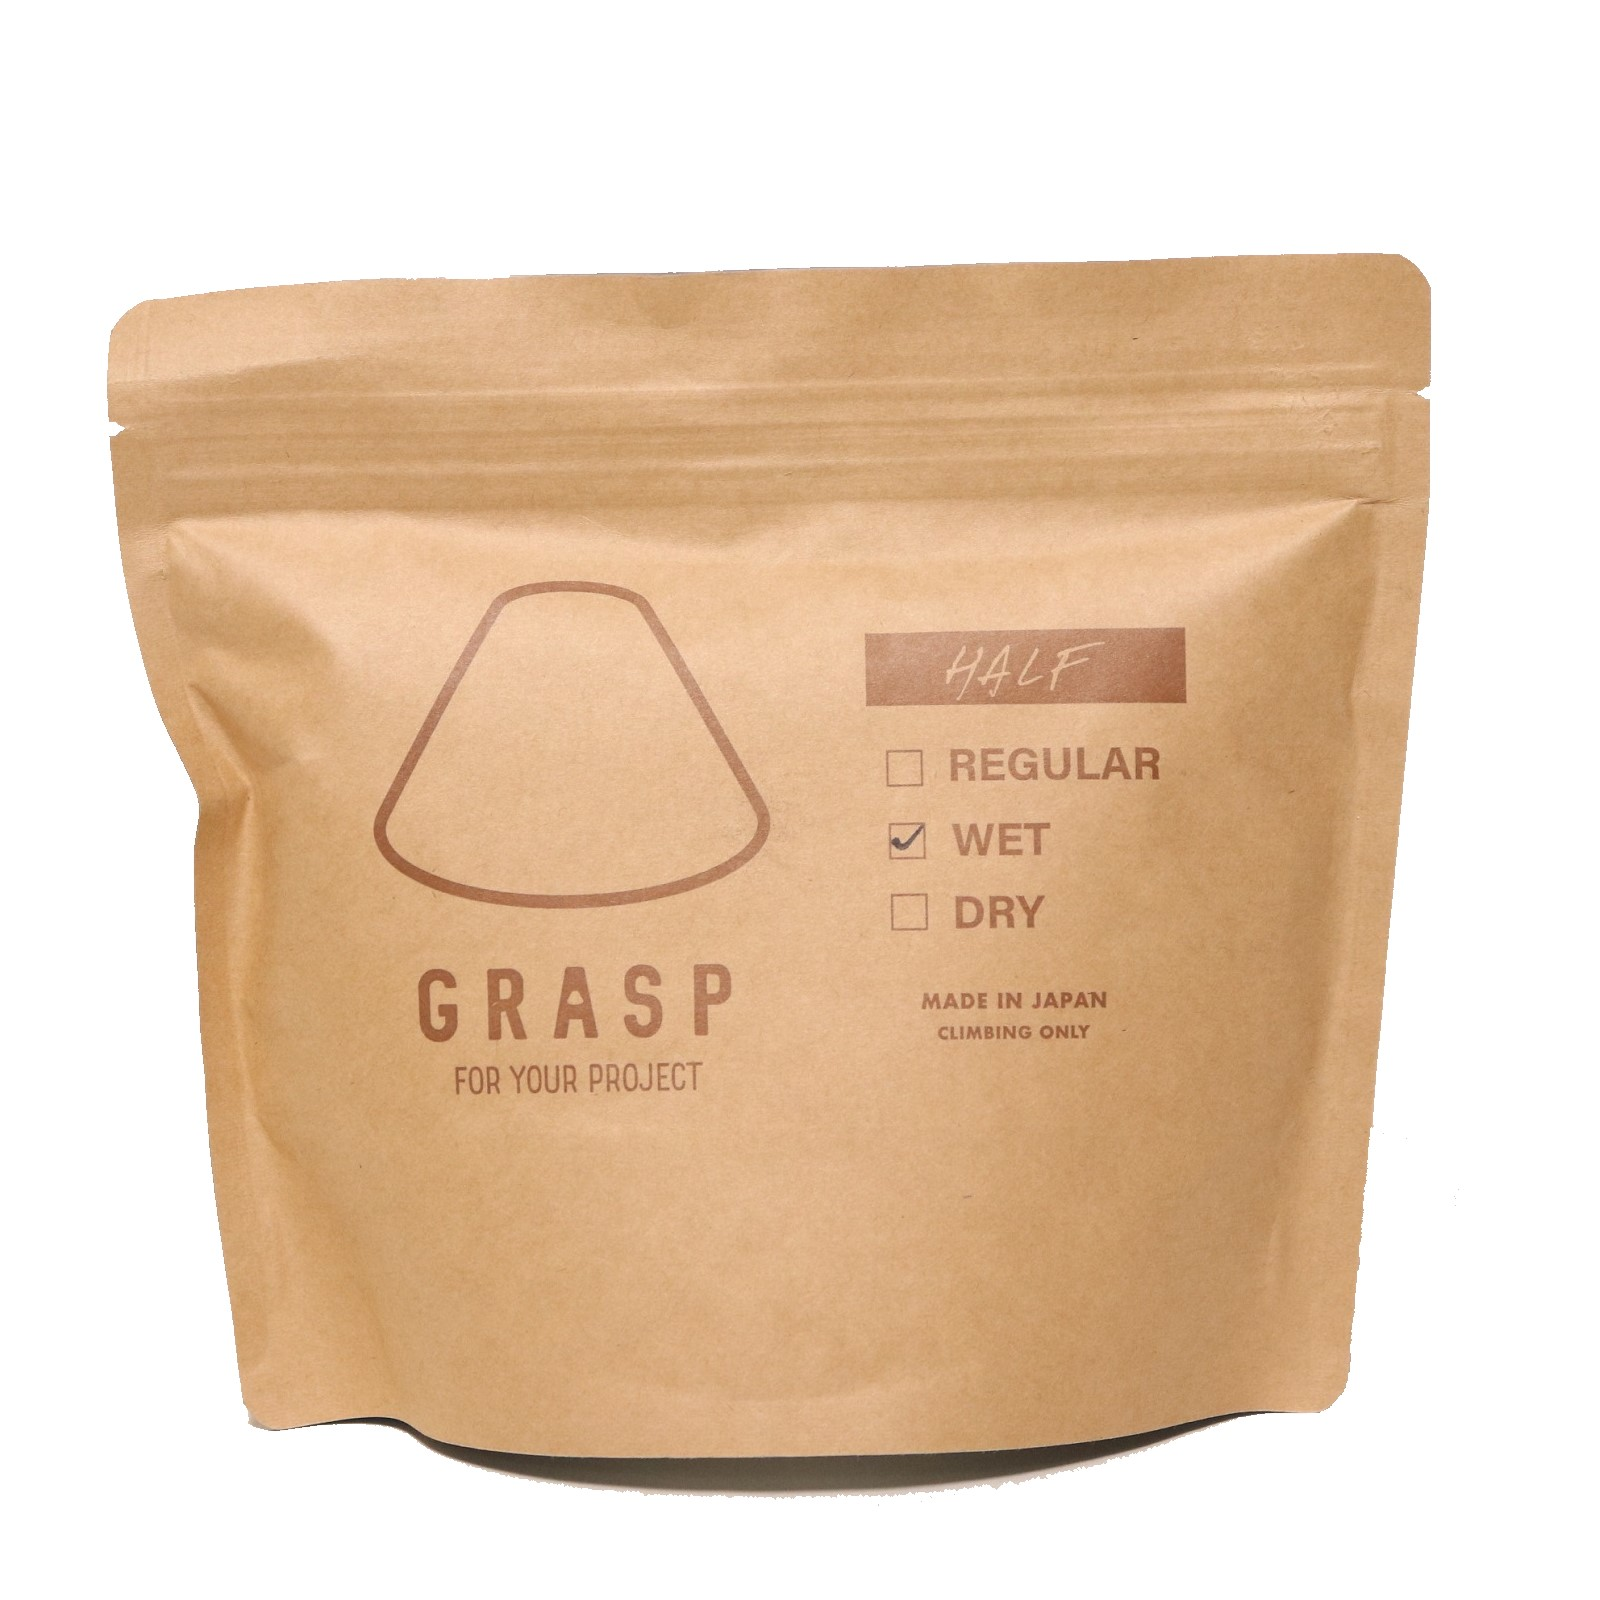 GRASP グラスプ ウェットコンディション【ハーフサイズ】